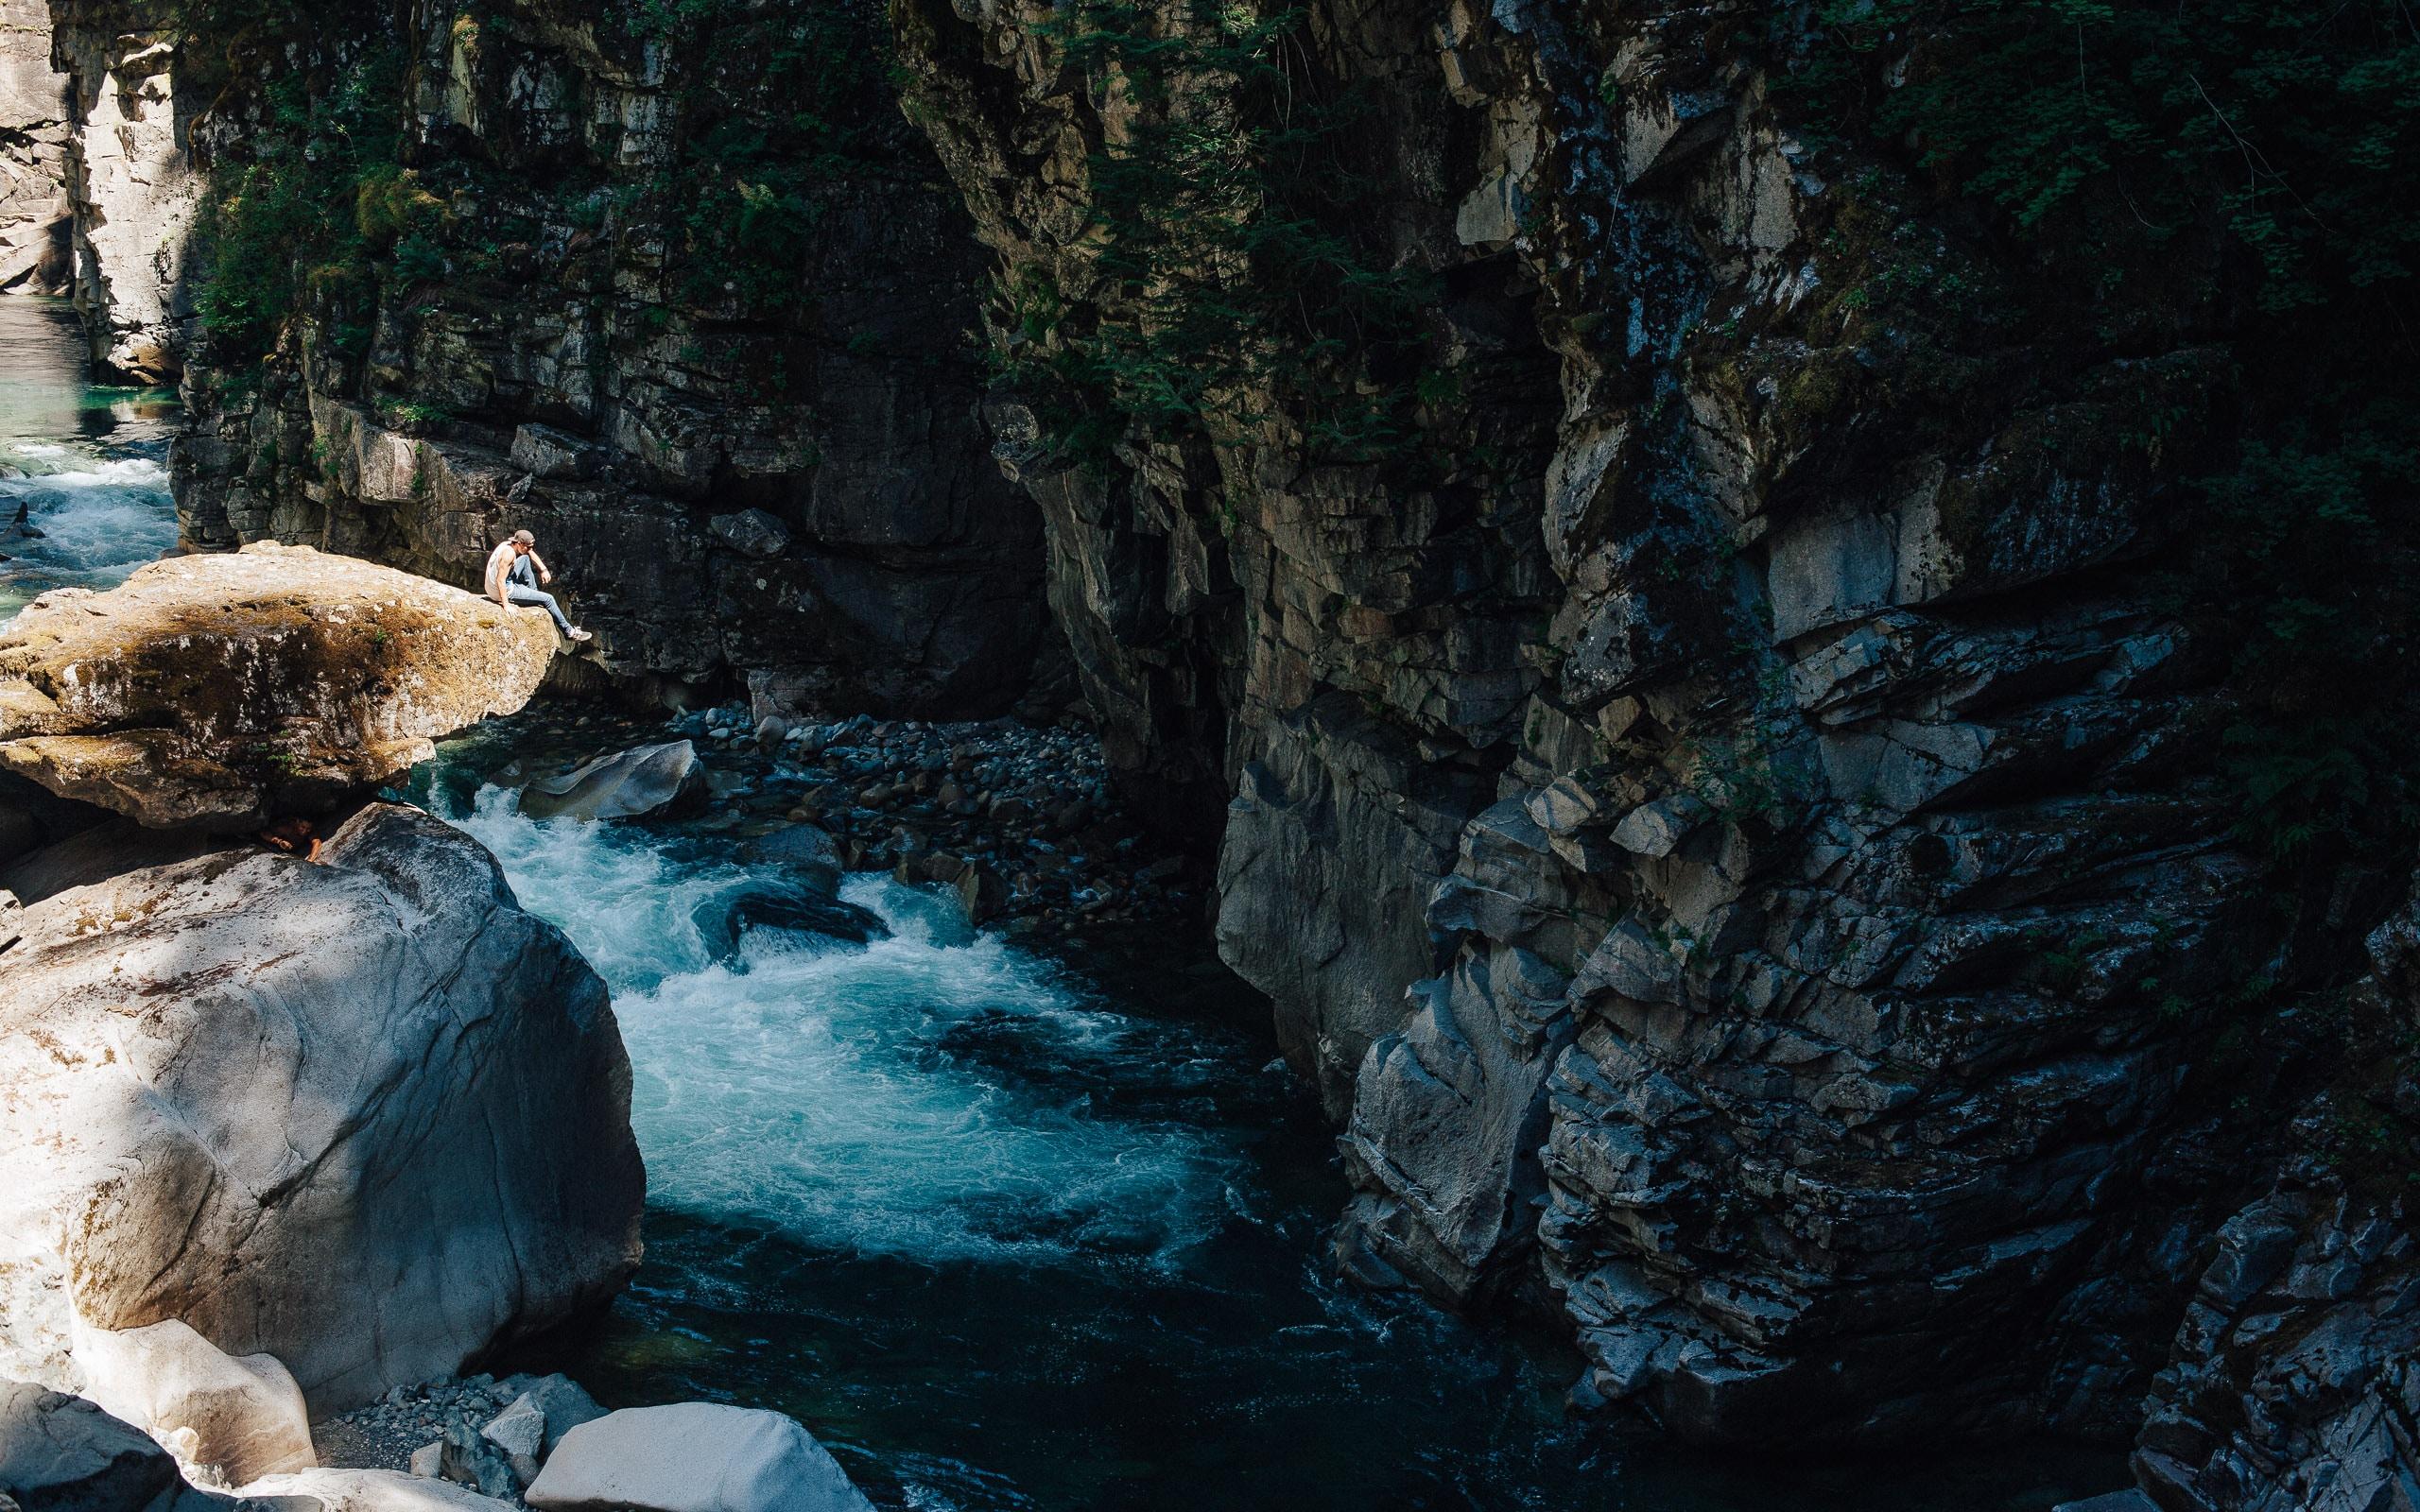 river between rock cliffs